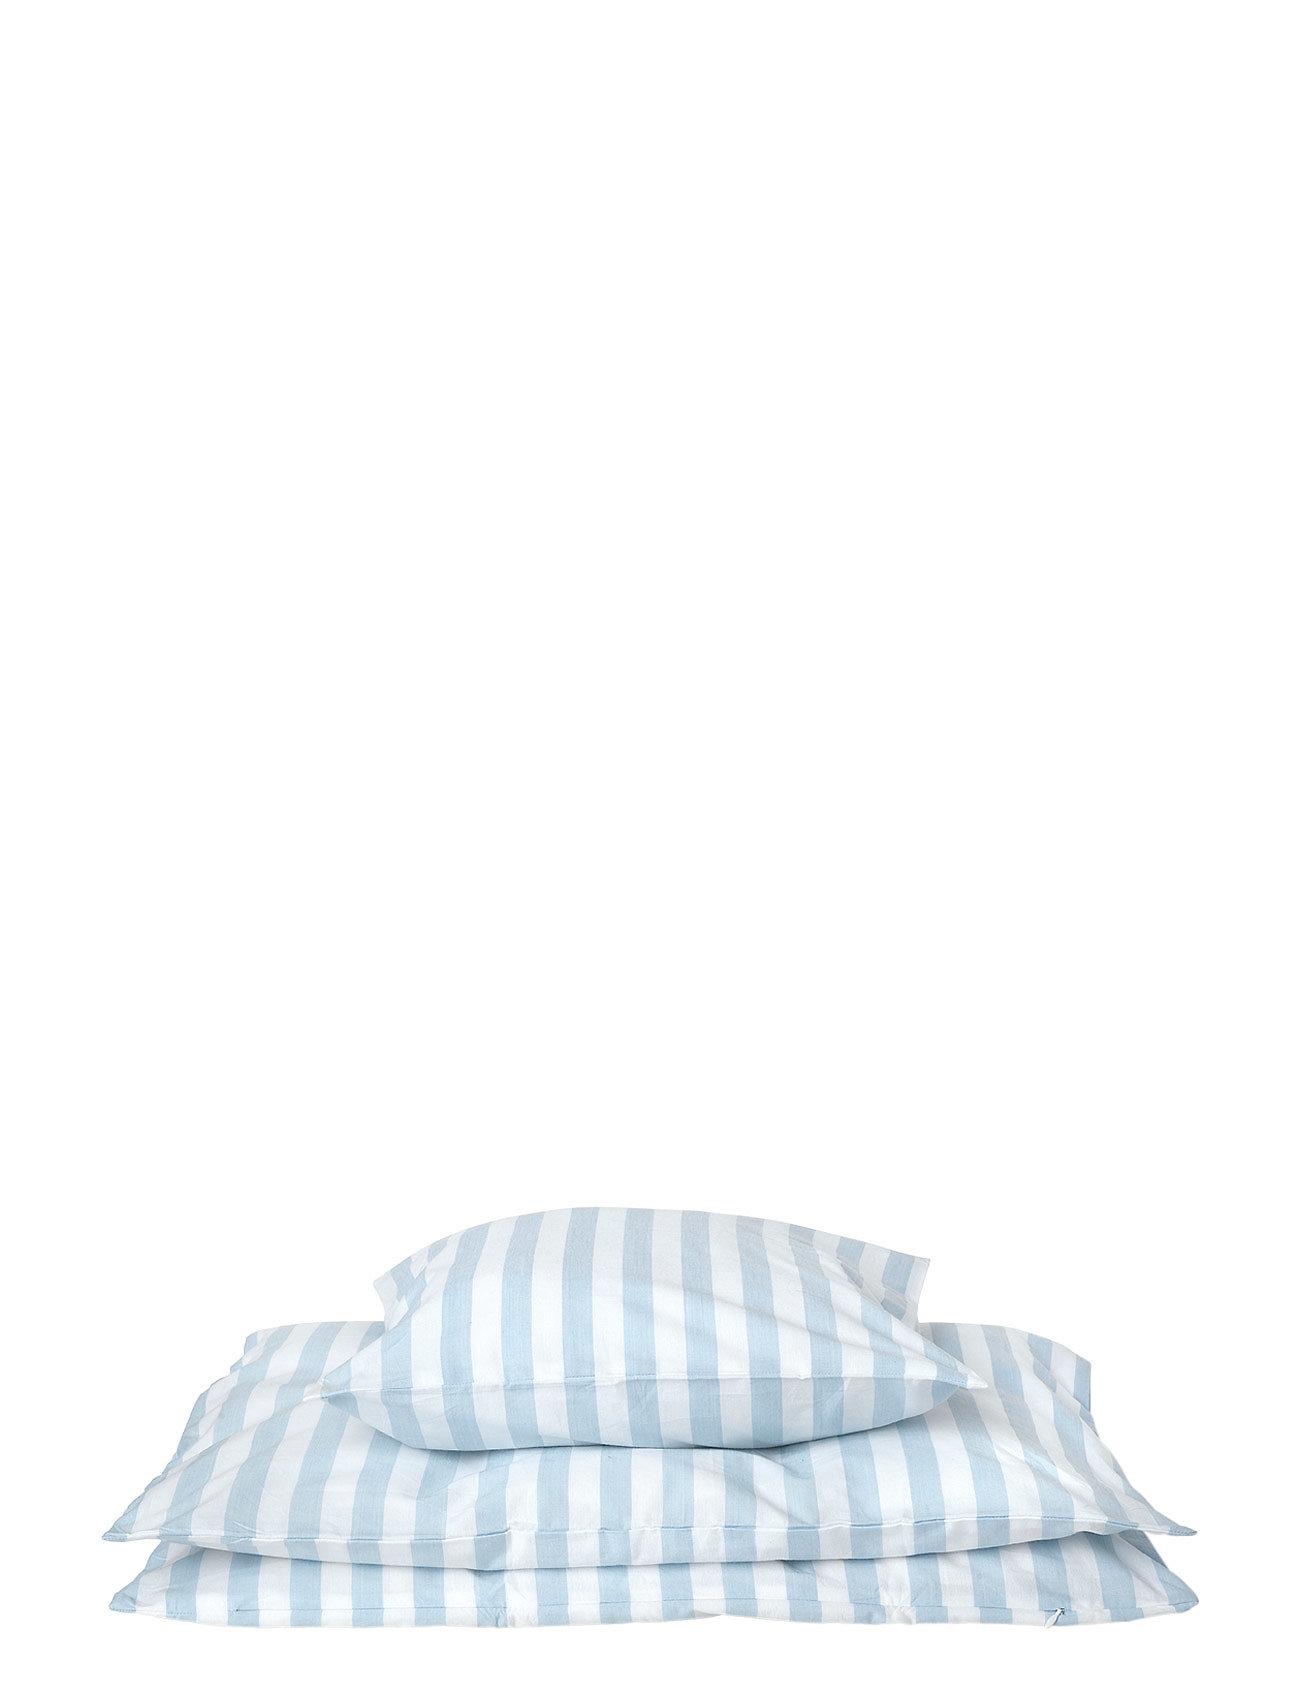 Bedding Y/D Stripe - Liewood